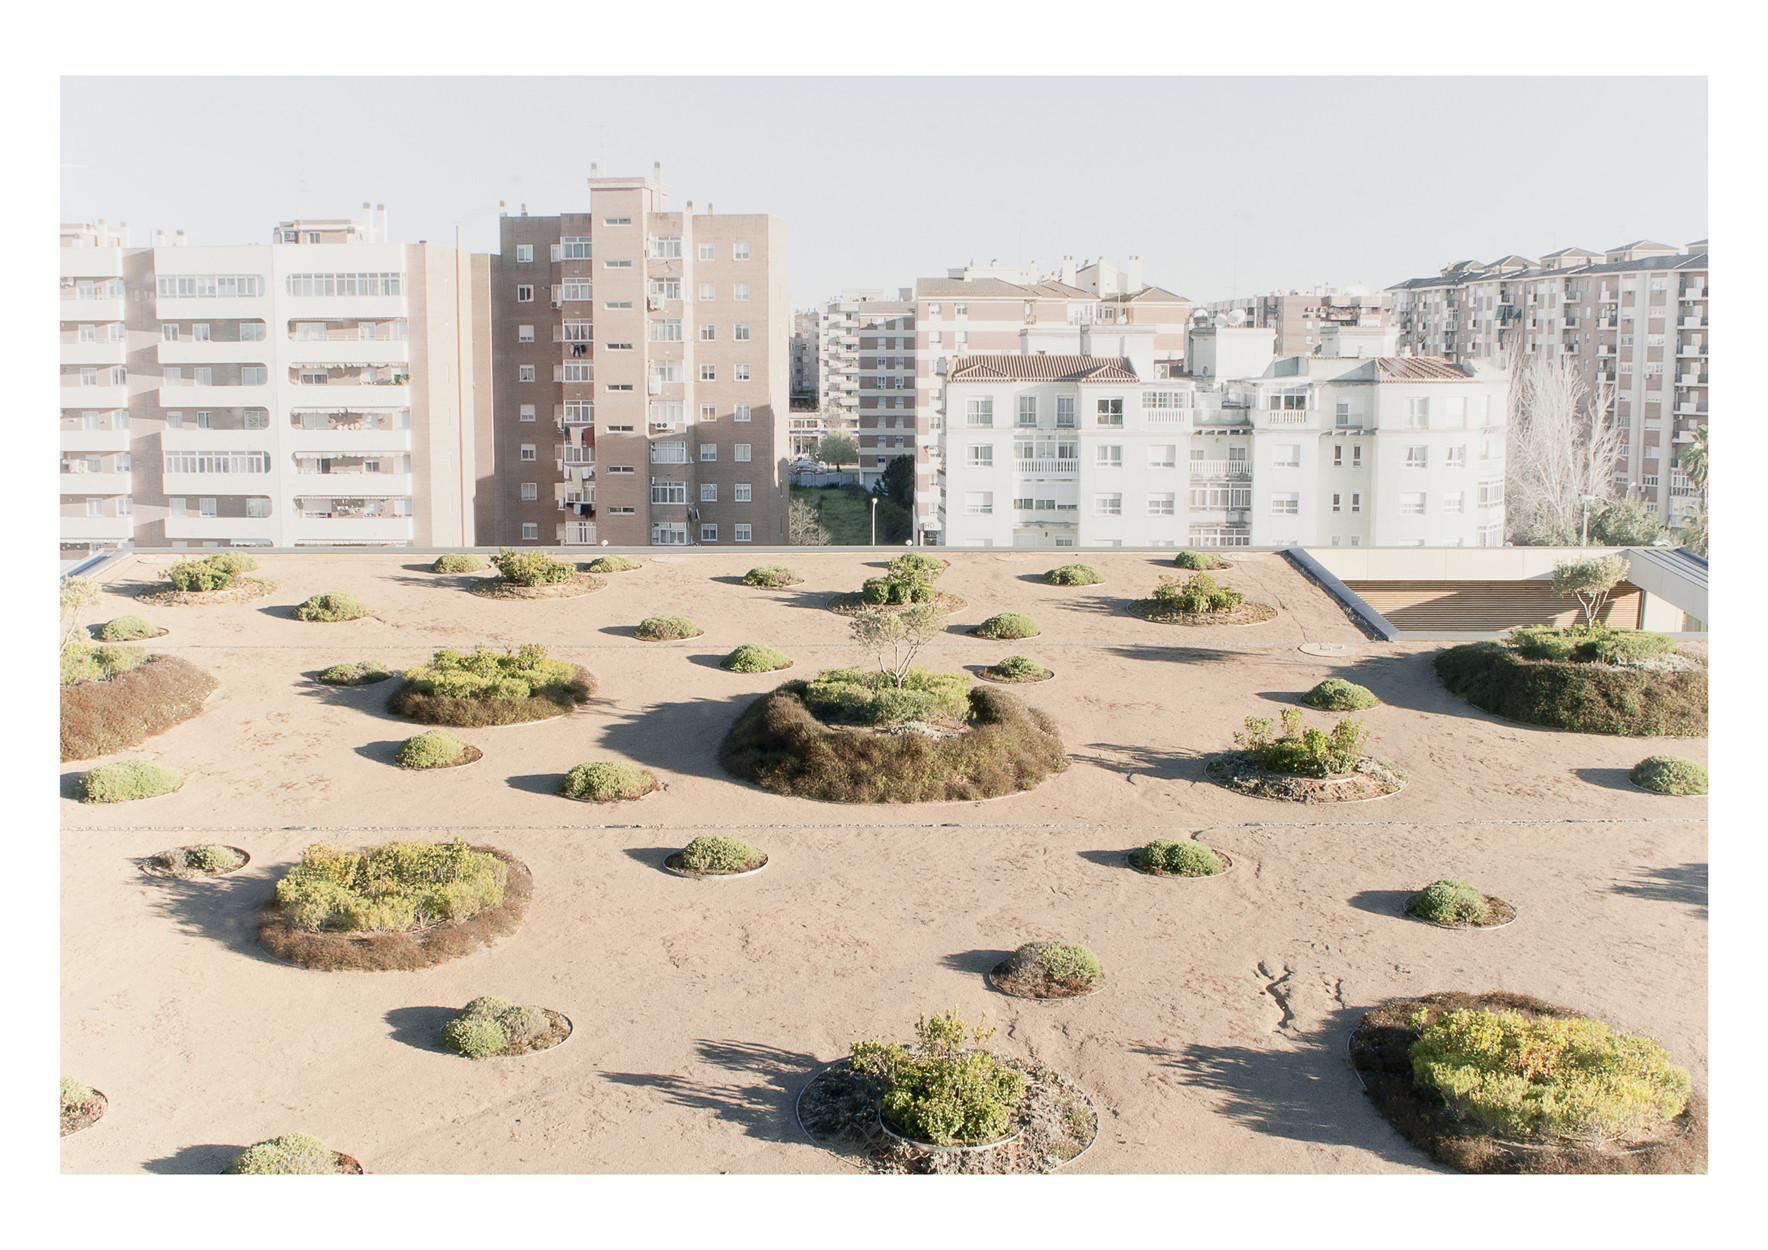 Paisaje y Arquitectura: Parque, jardines y cubierta verde de Caja Badajoz por Cjcpaisaje, © Cristina Jorge Camacho